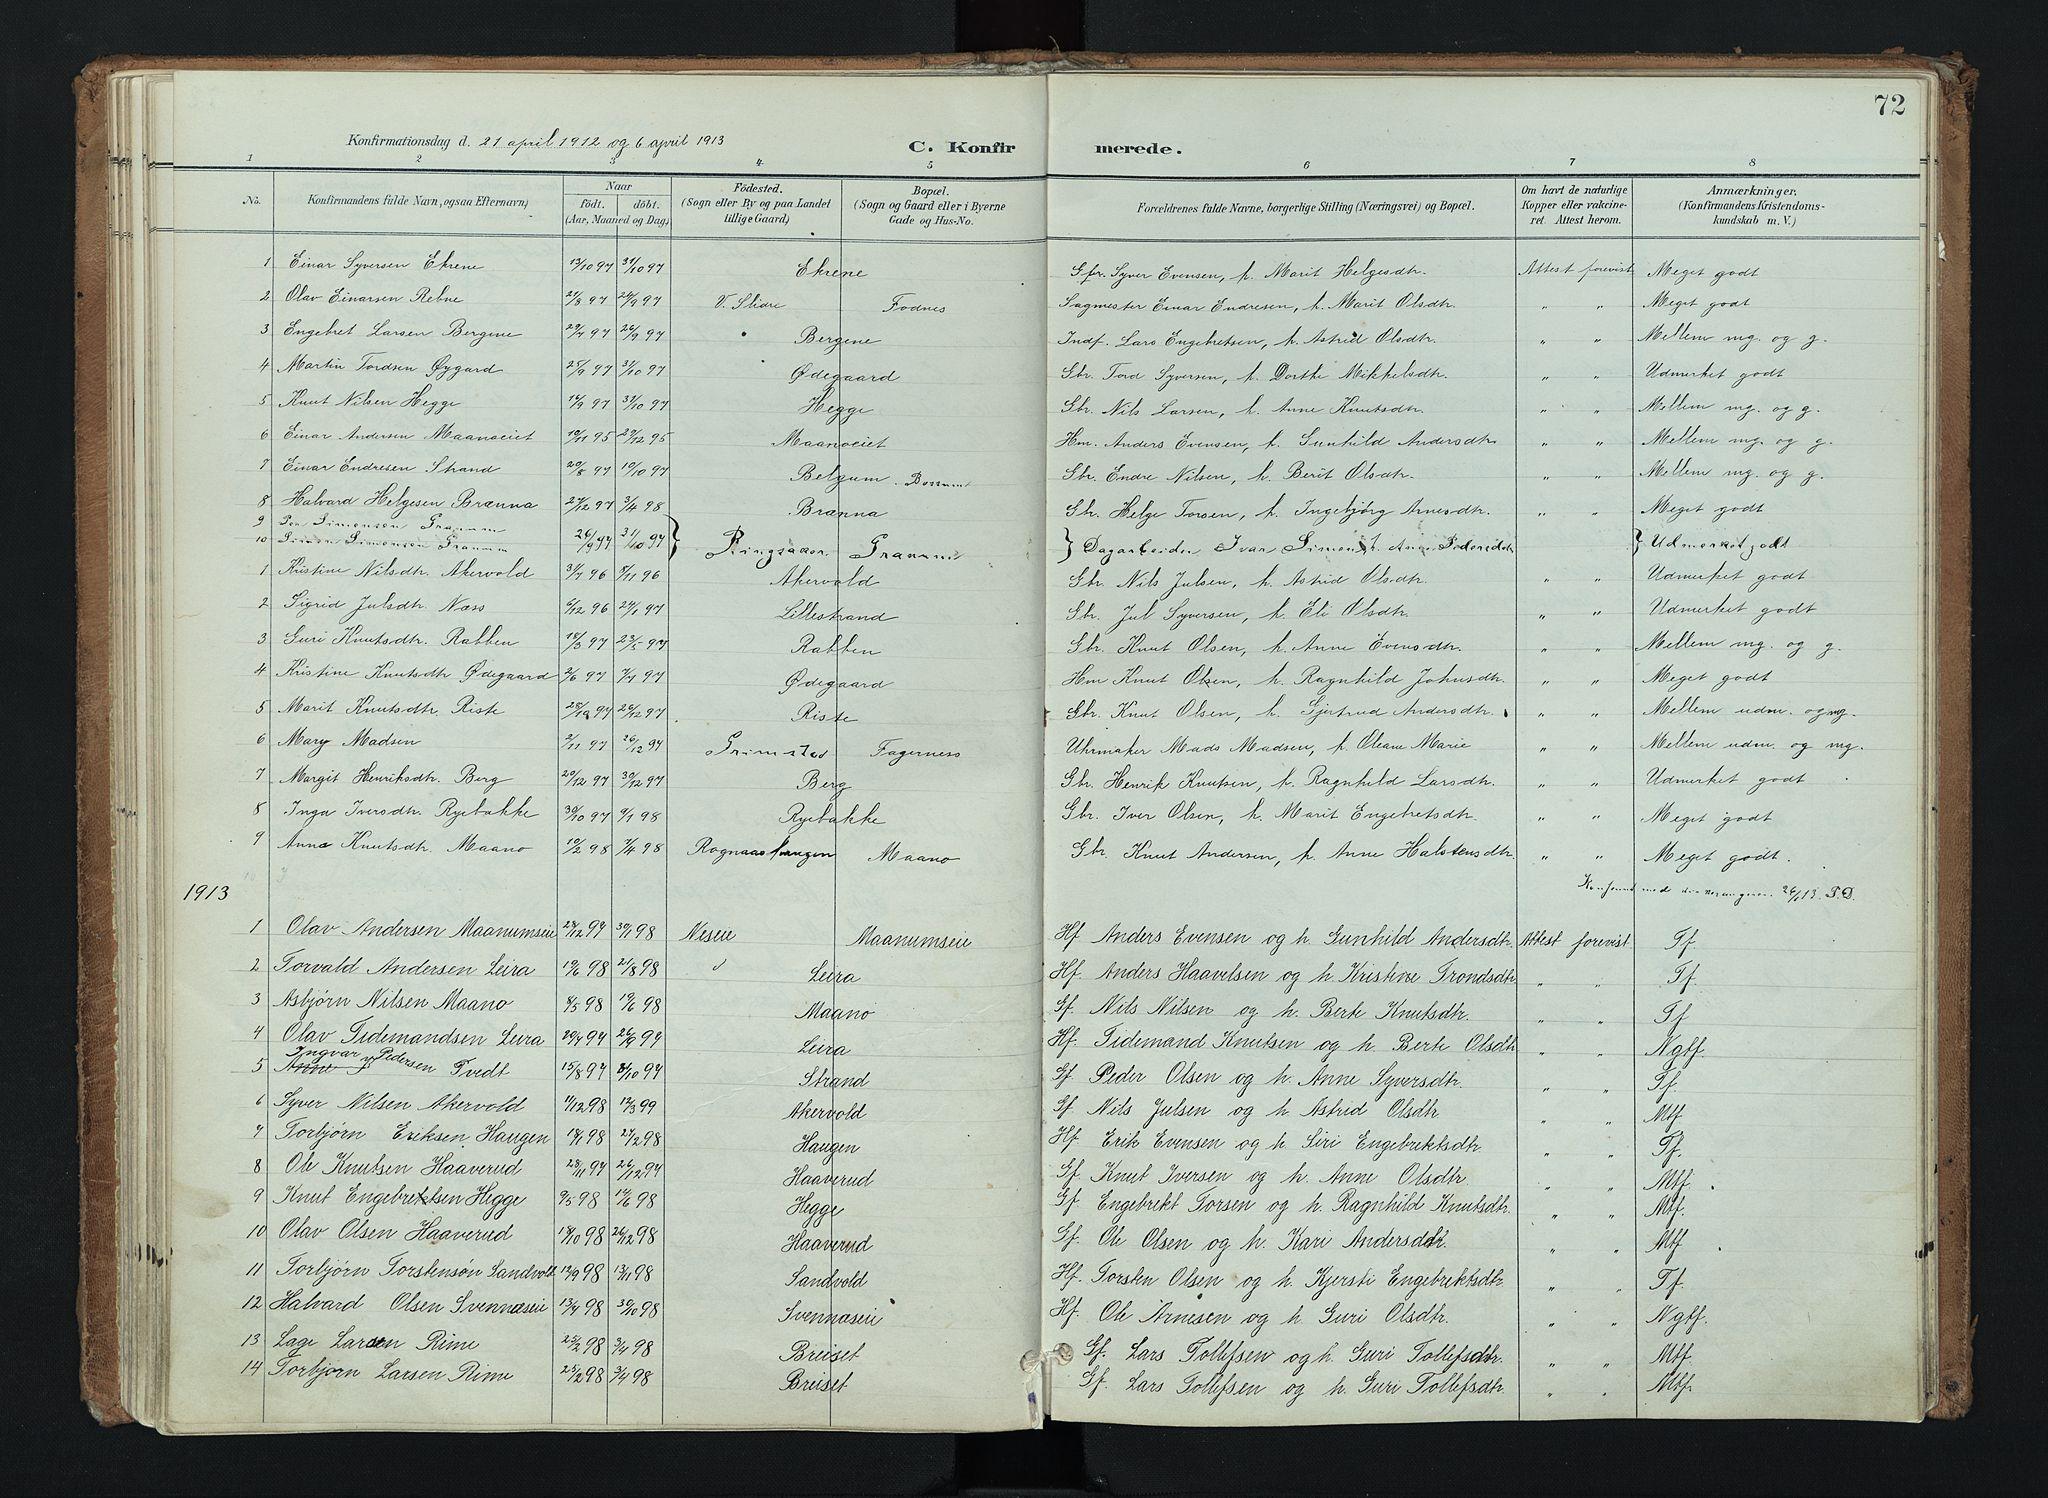 SAH, Nord-Aurdal prestekontor, Ministerialbok nr. 16, 1897-1925, s. 72